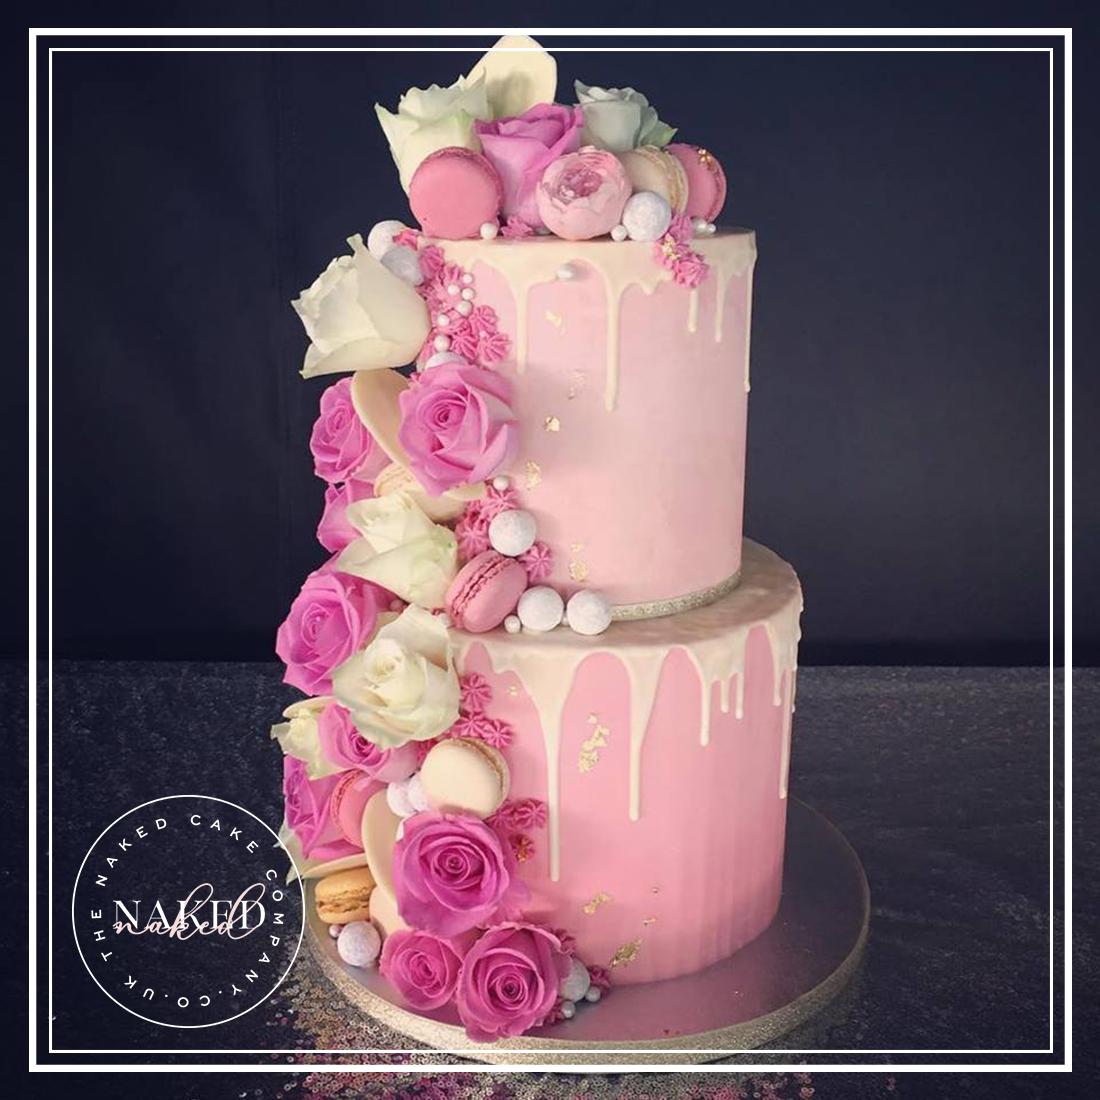 Fully Iced Pink Chocolate Ganache Cake